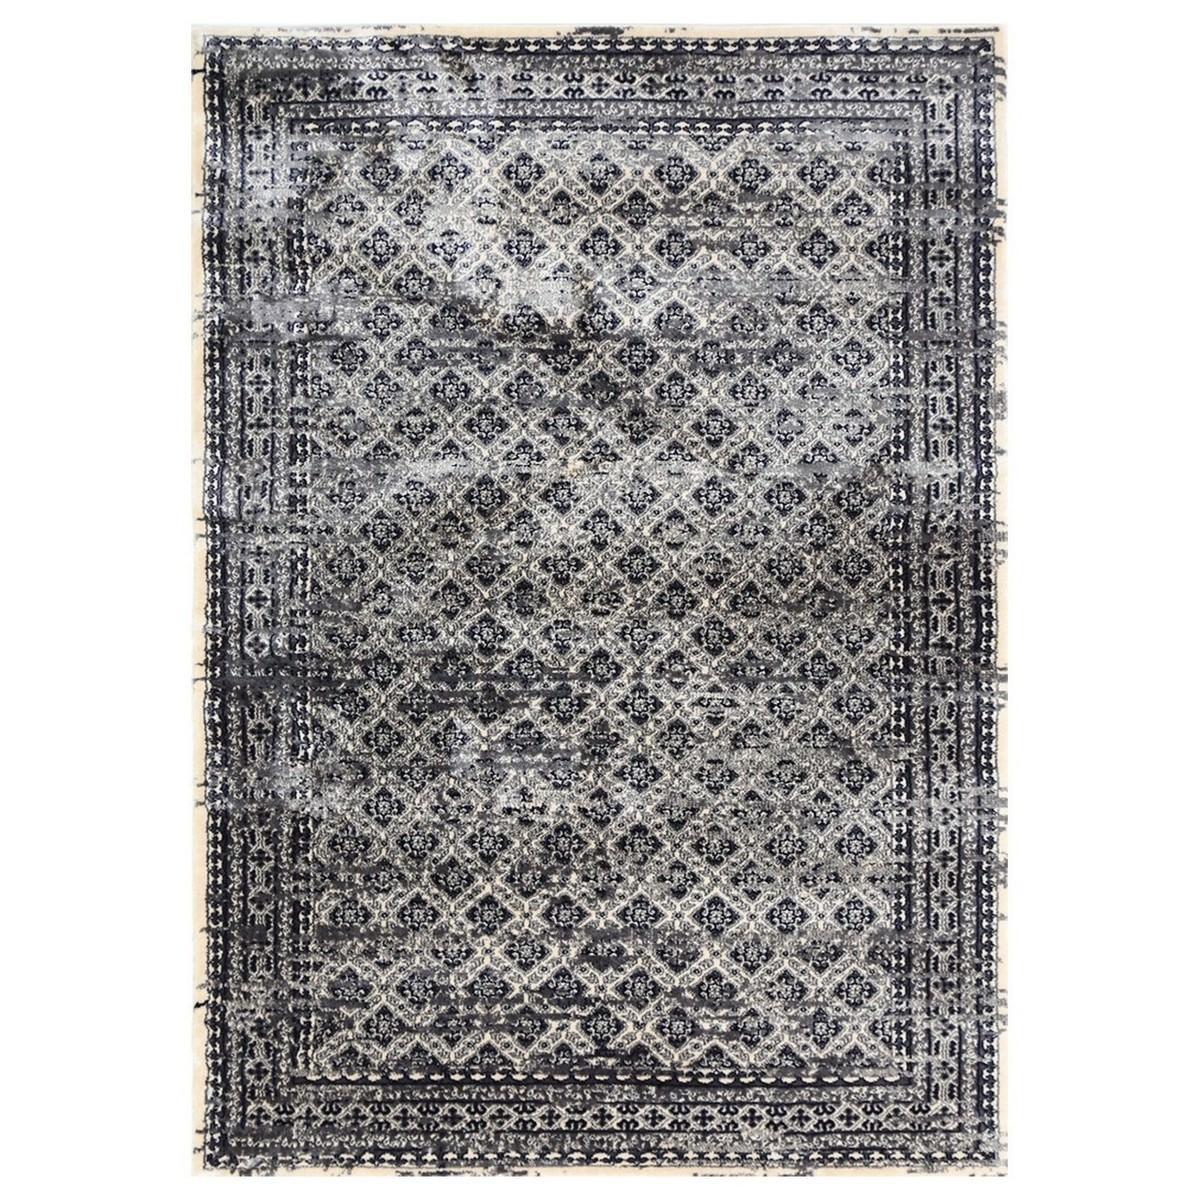 Artifact Hester Distressed Oriental Rug, 160x230cm